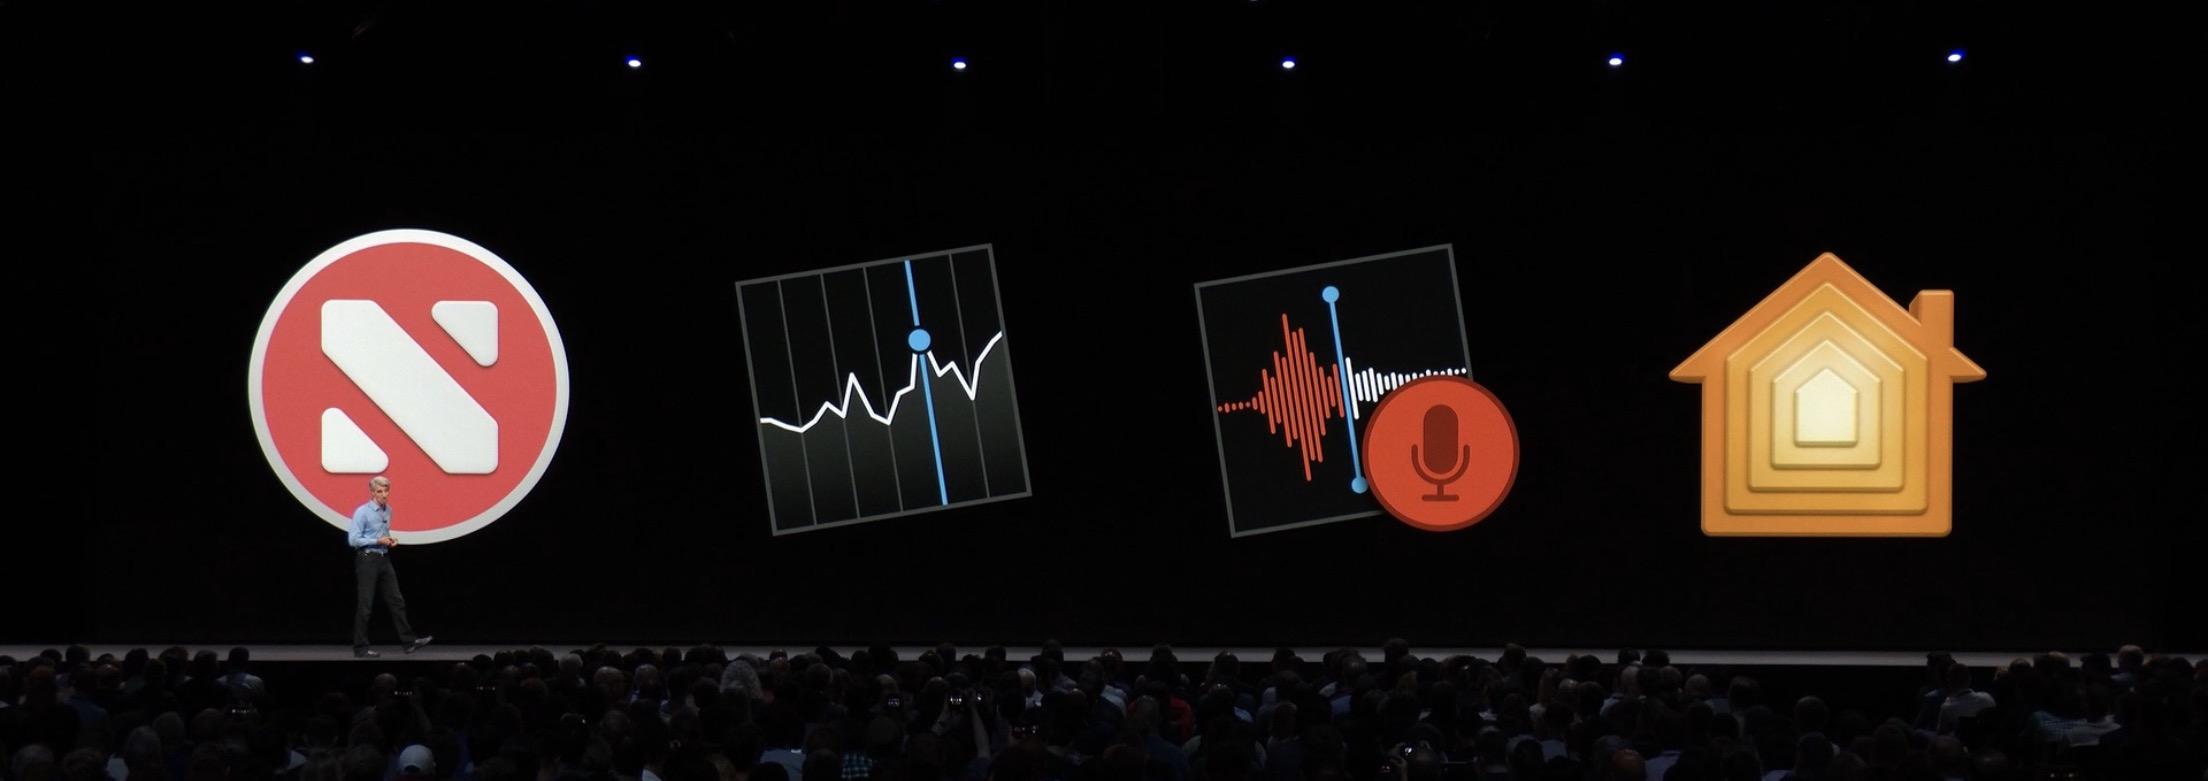 News,株価,ボイスメモ,ホームのアプリアイコン画像